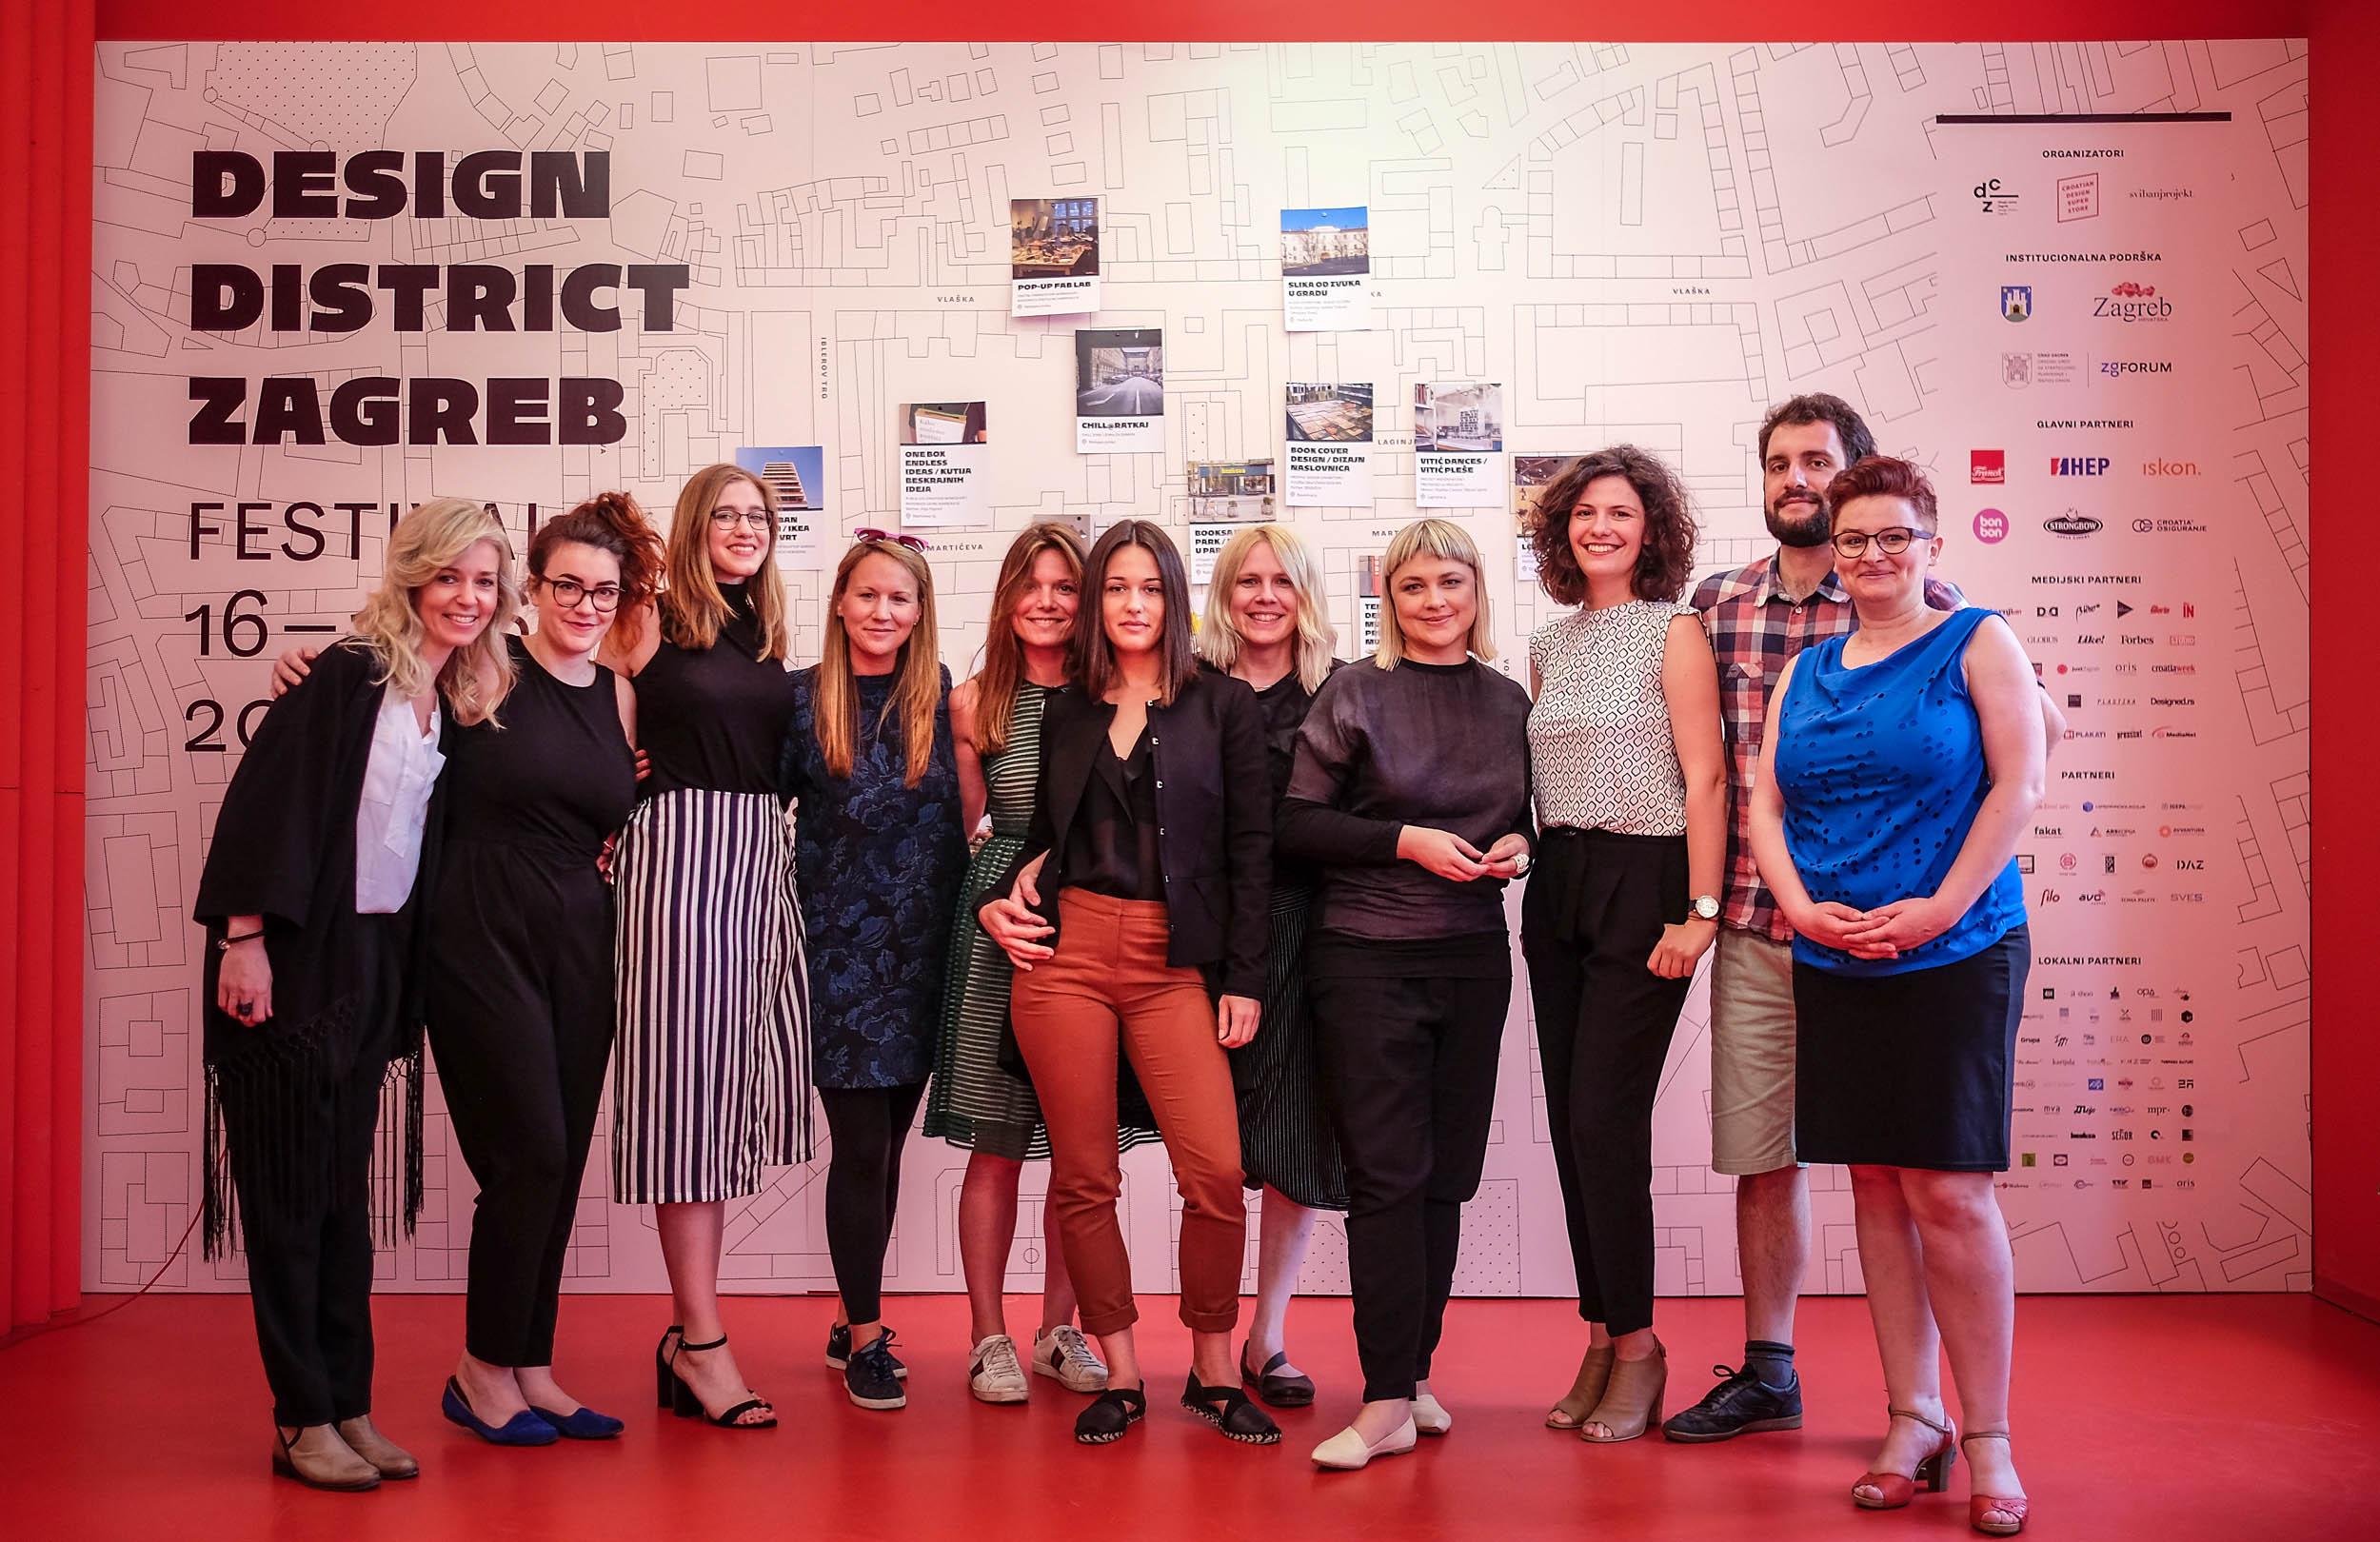 Design District Zagreb Starts on June 16th